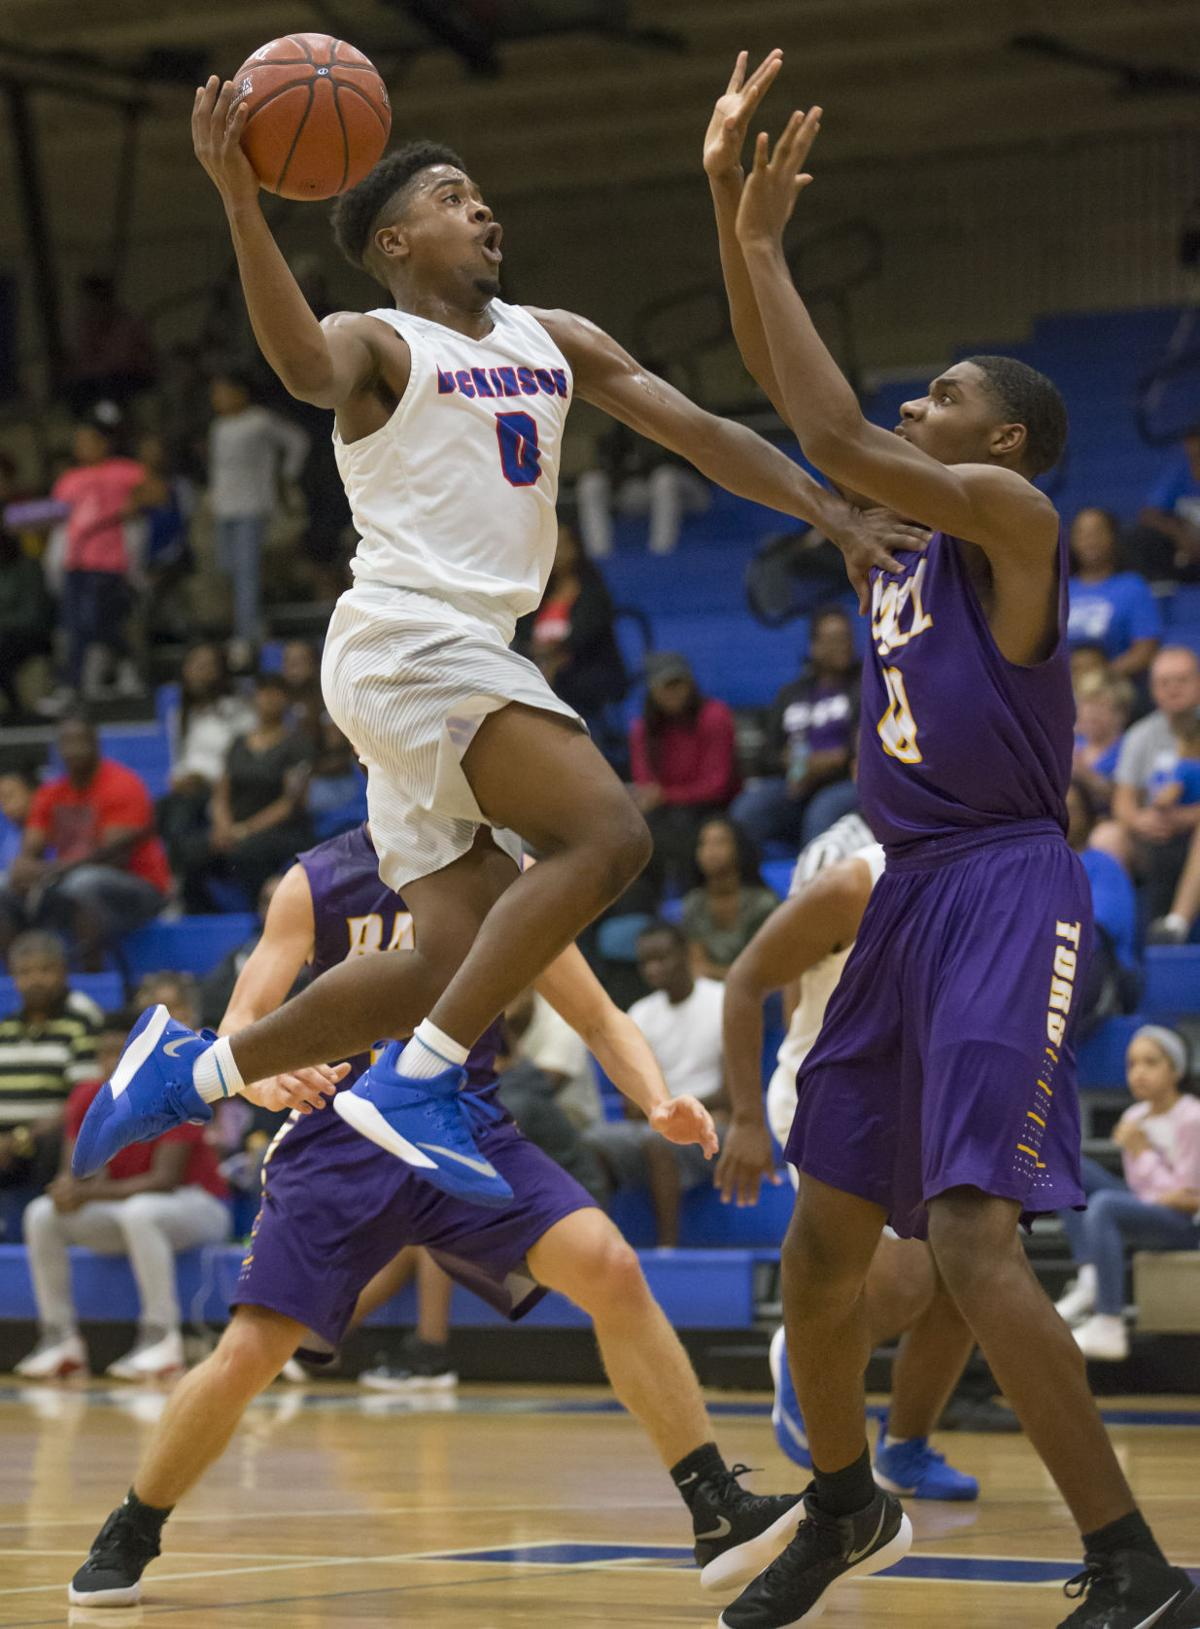 Dickinson vs Ball Boys Basketball